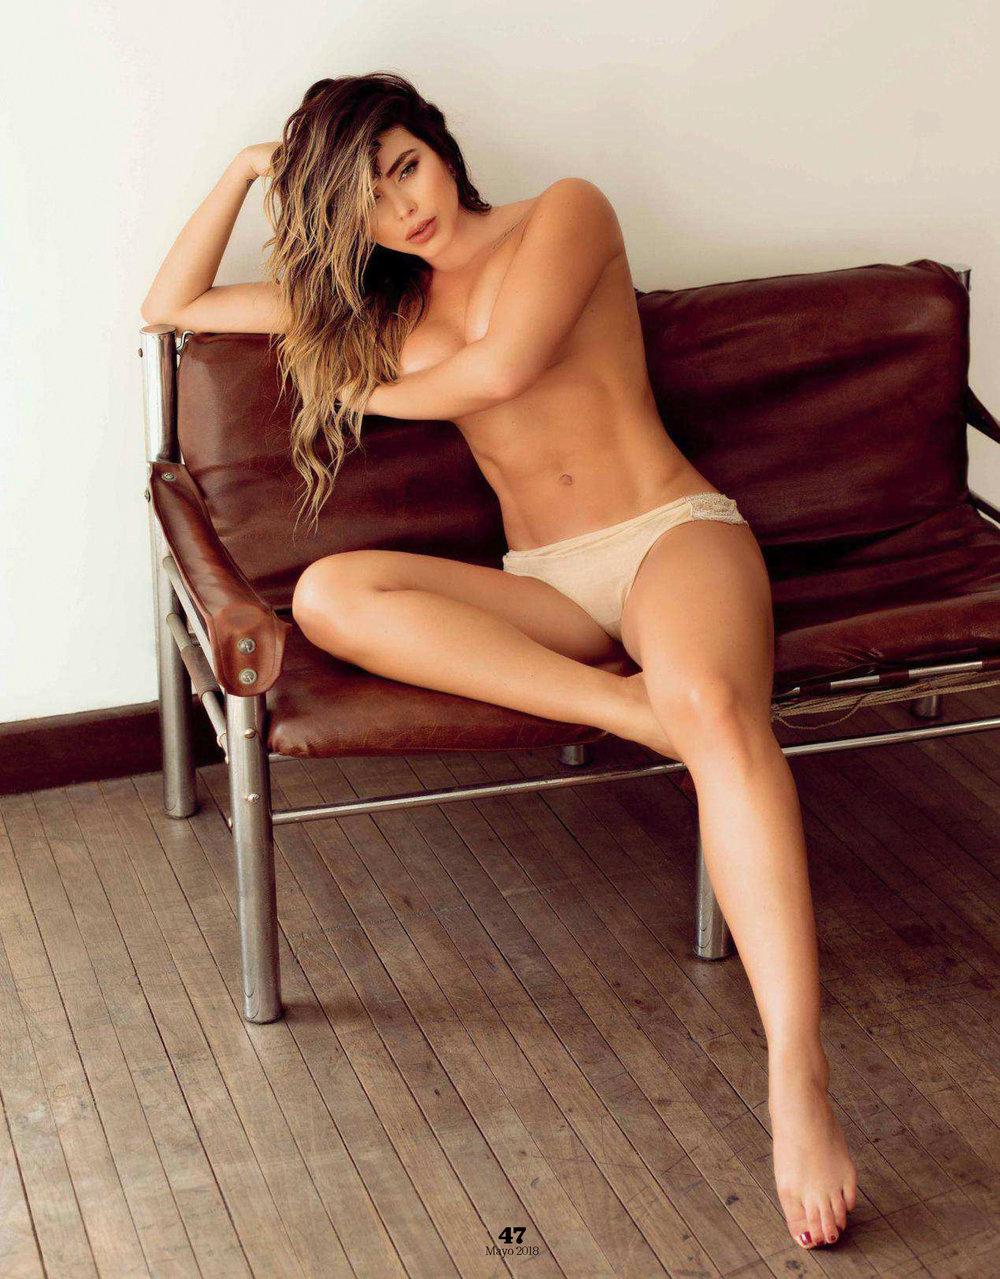 fabitogomez_201805-Playboy México-49.jpg